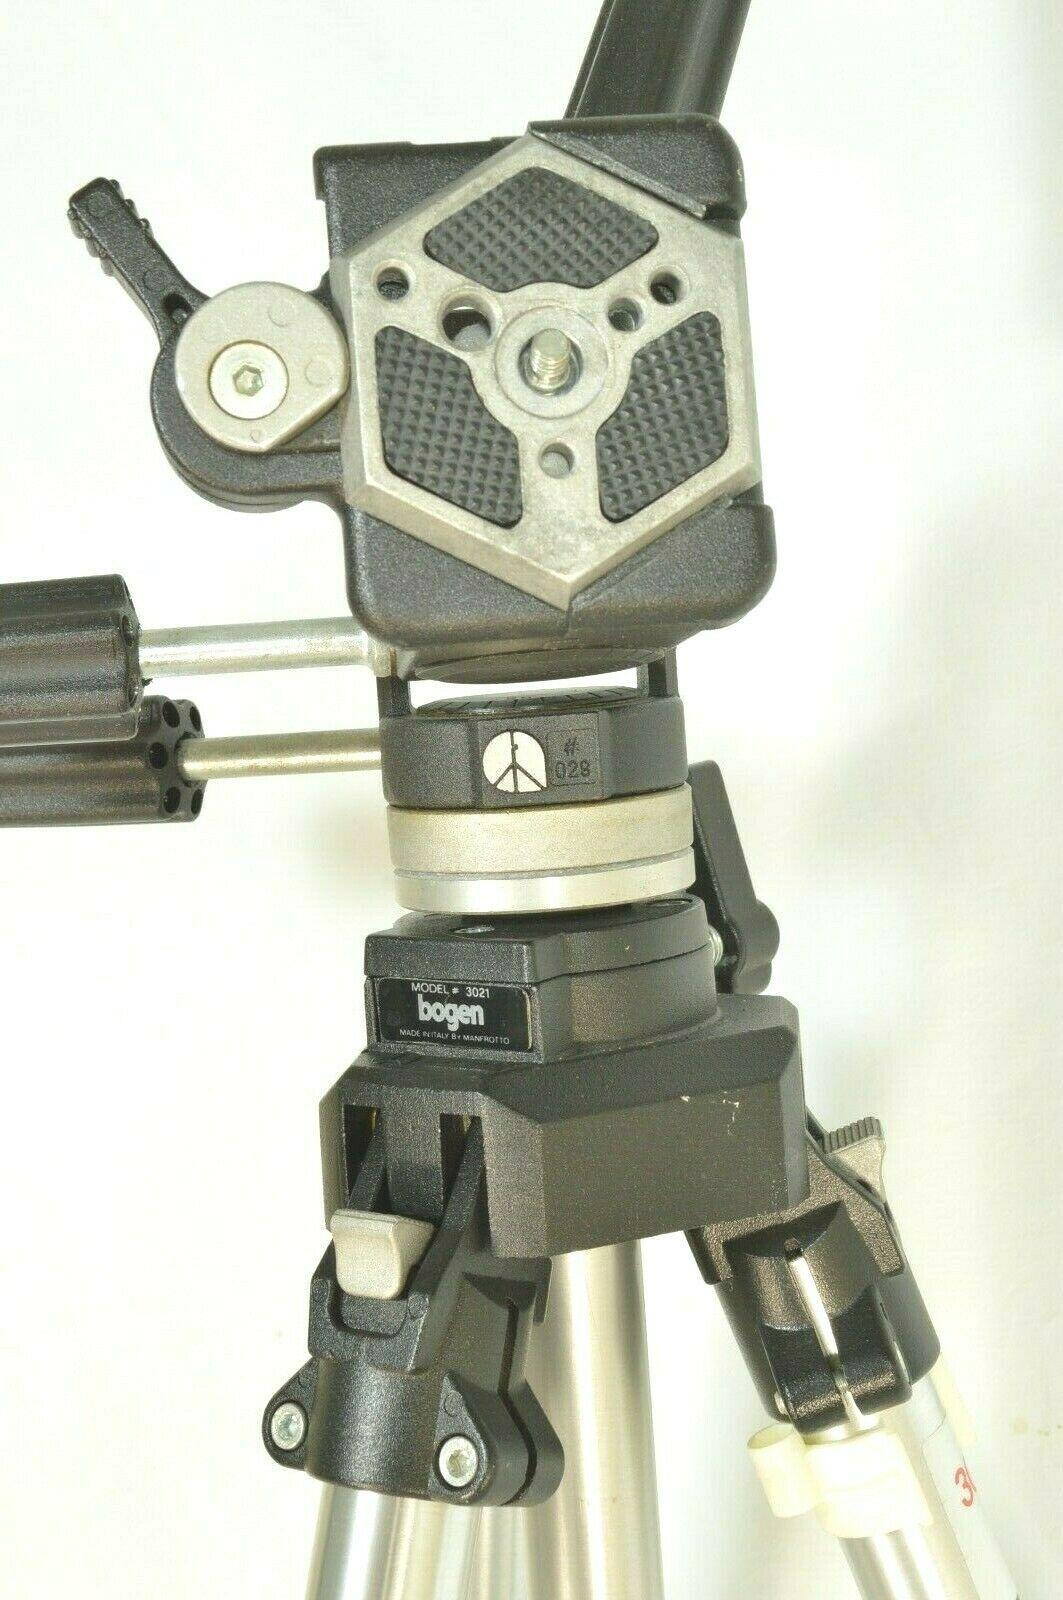 Manfrotto Bogen 3021 pro camera tripod +3047 Deluxe 3-way Pan/tilt Head image 5